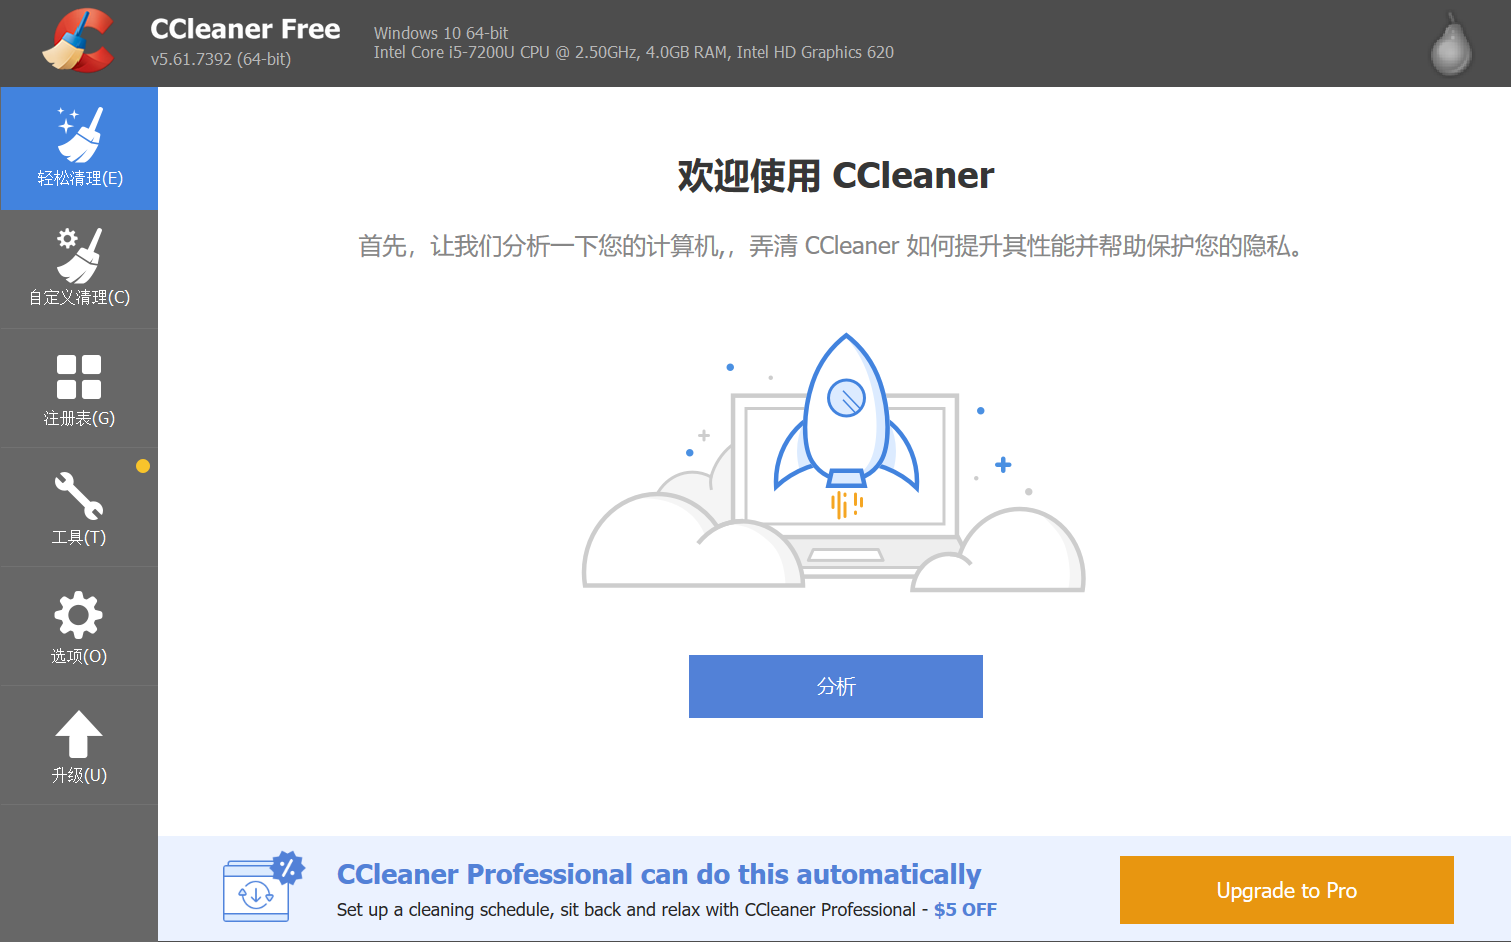 使用 CCleaner 扫描电脑并清理